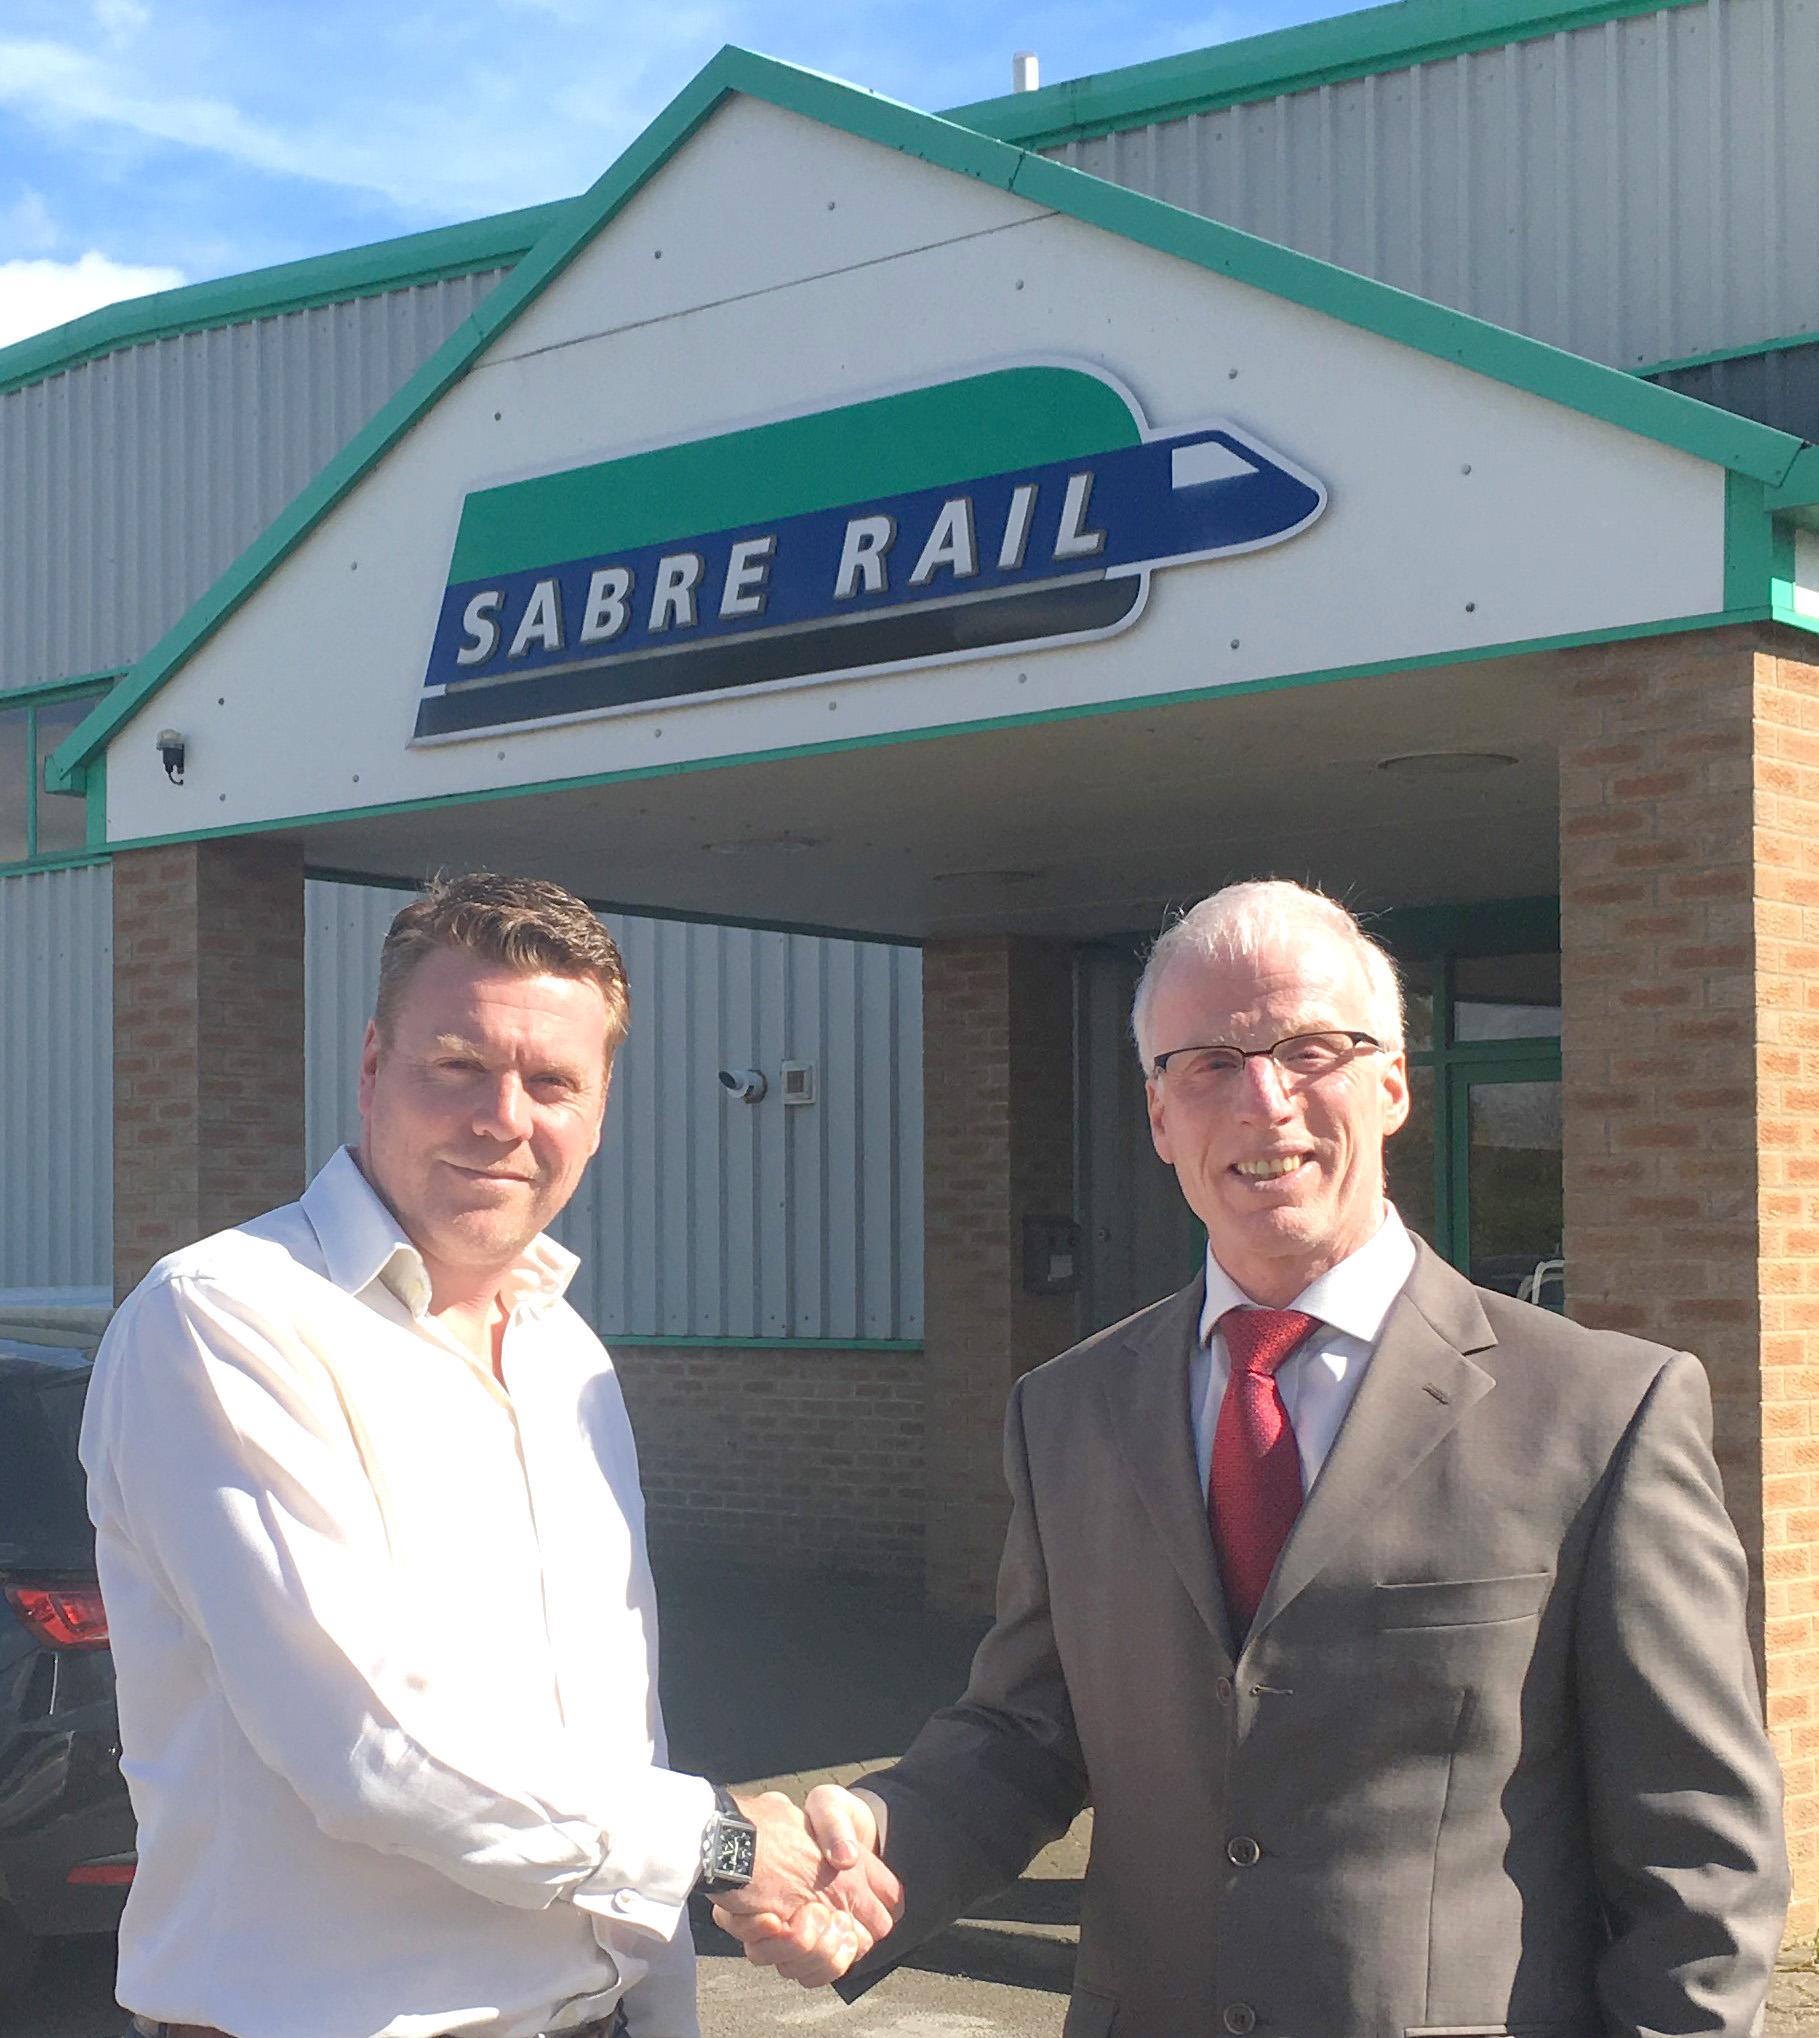 Sabre Rail Announce Senior Organisational Changes